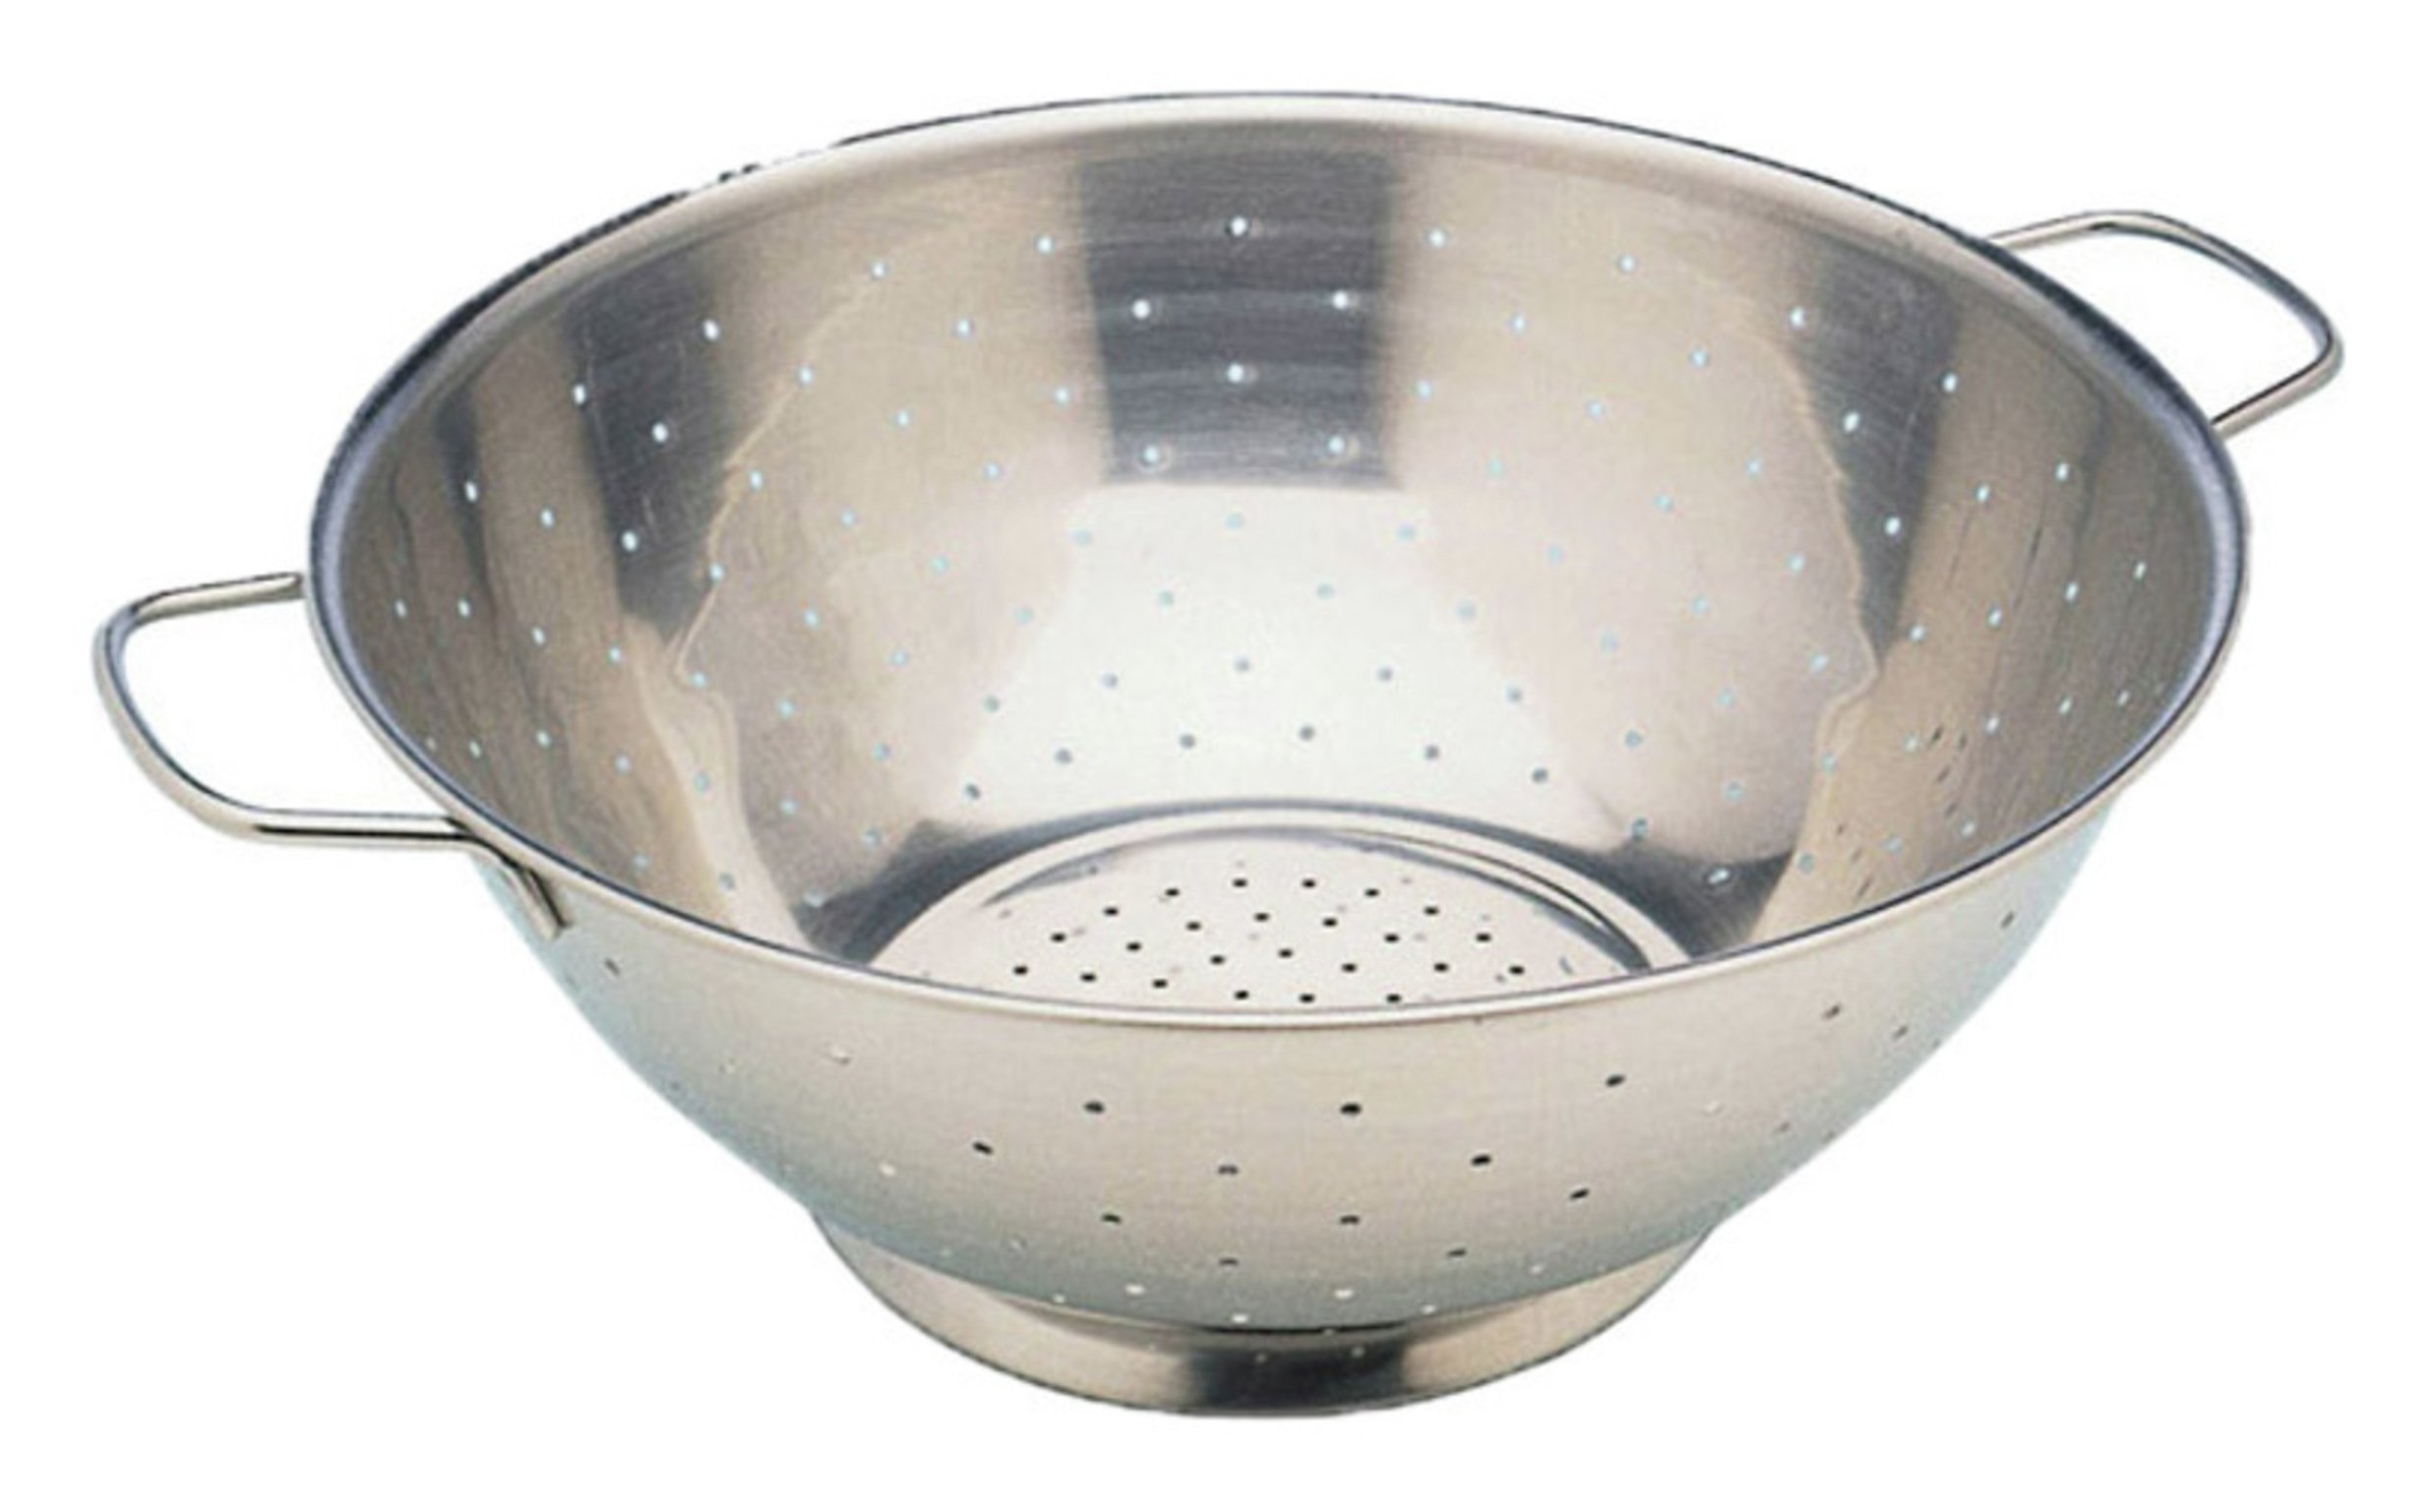 Zodiac 41cm Rice Colander - Stainless Steel